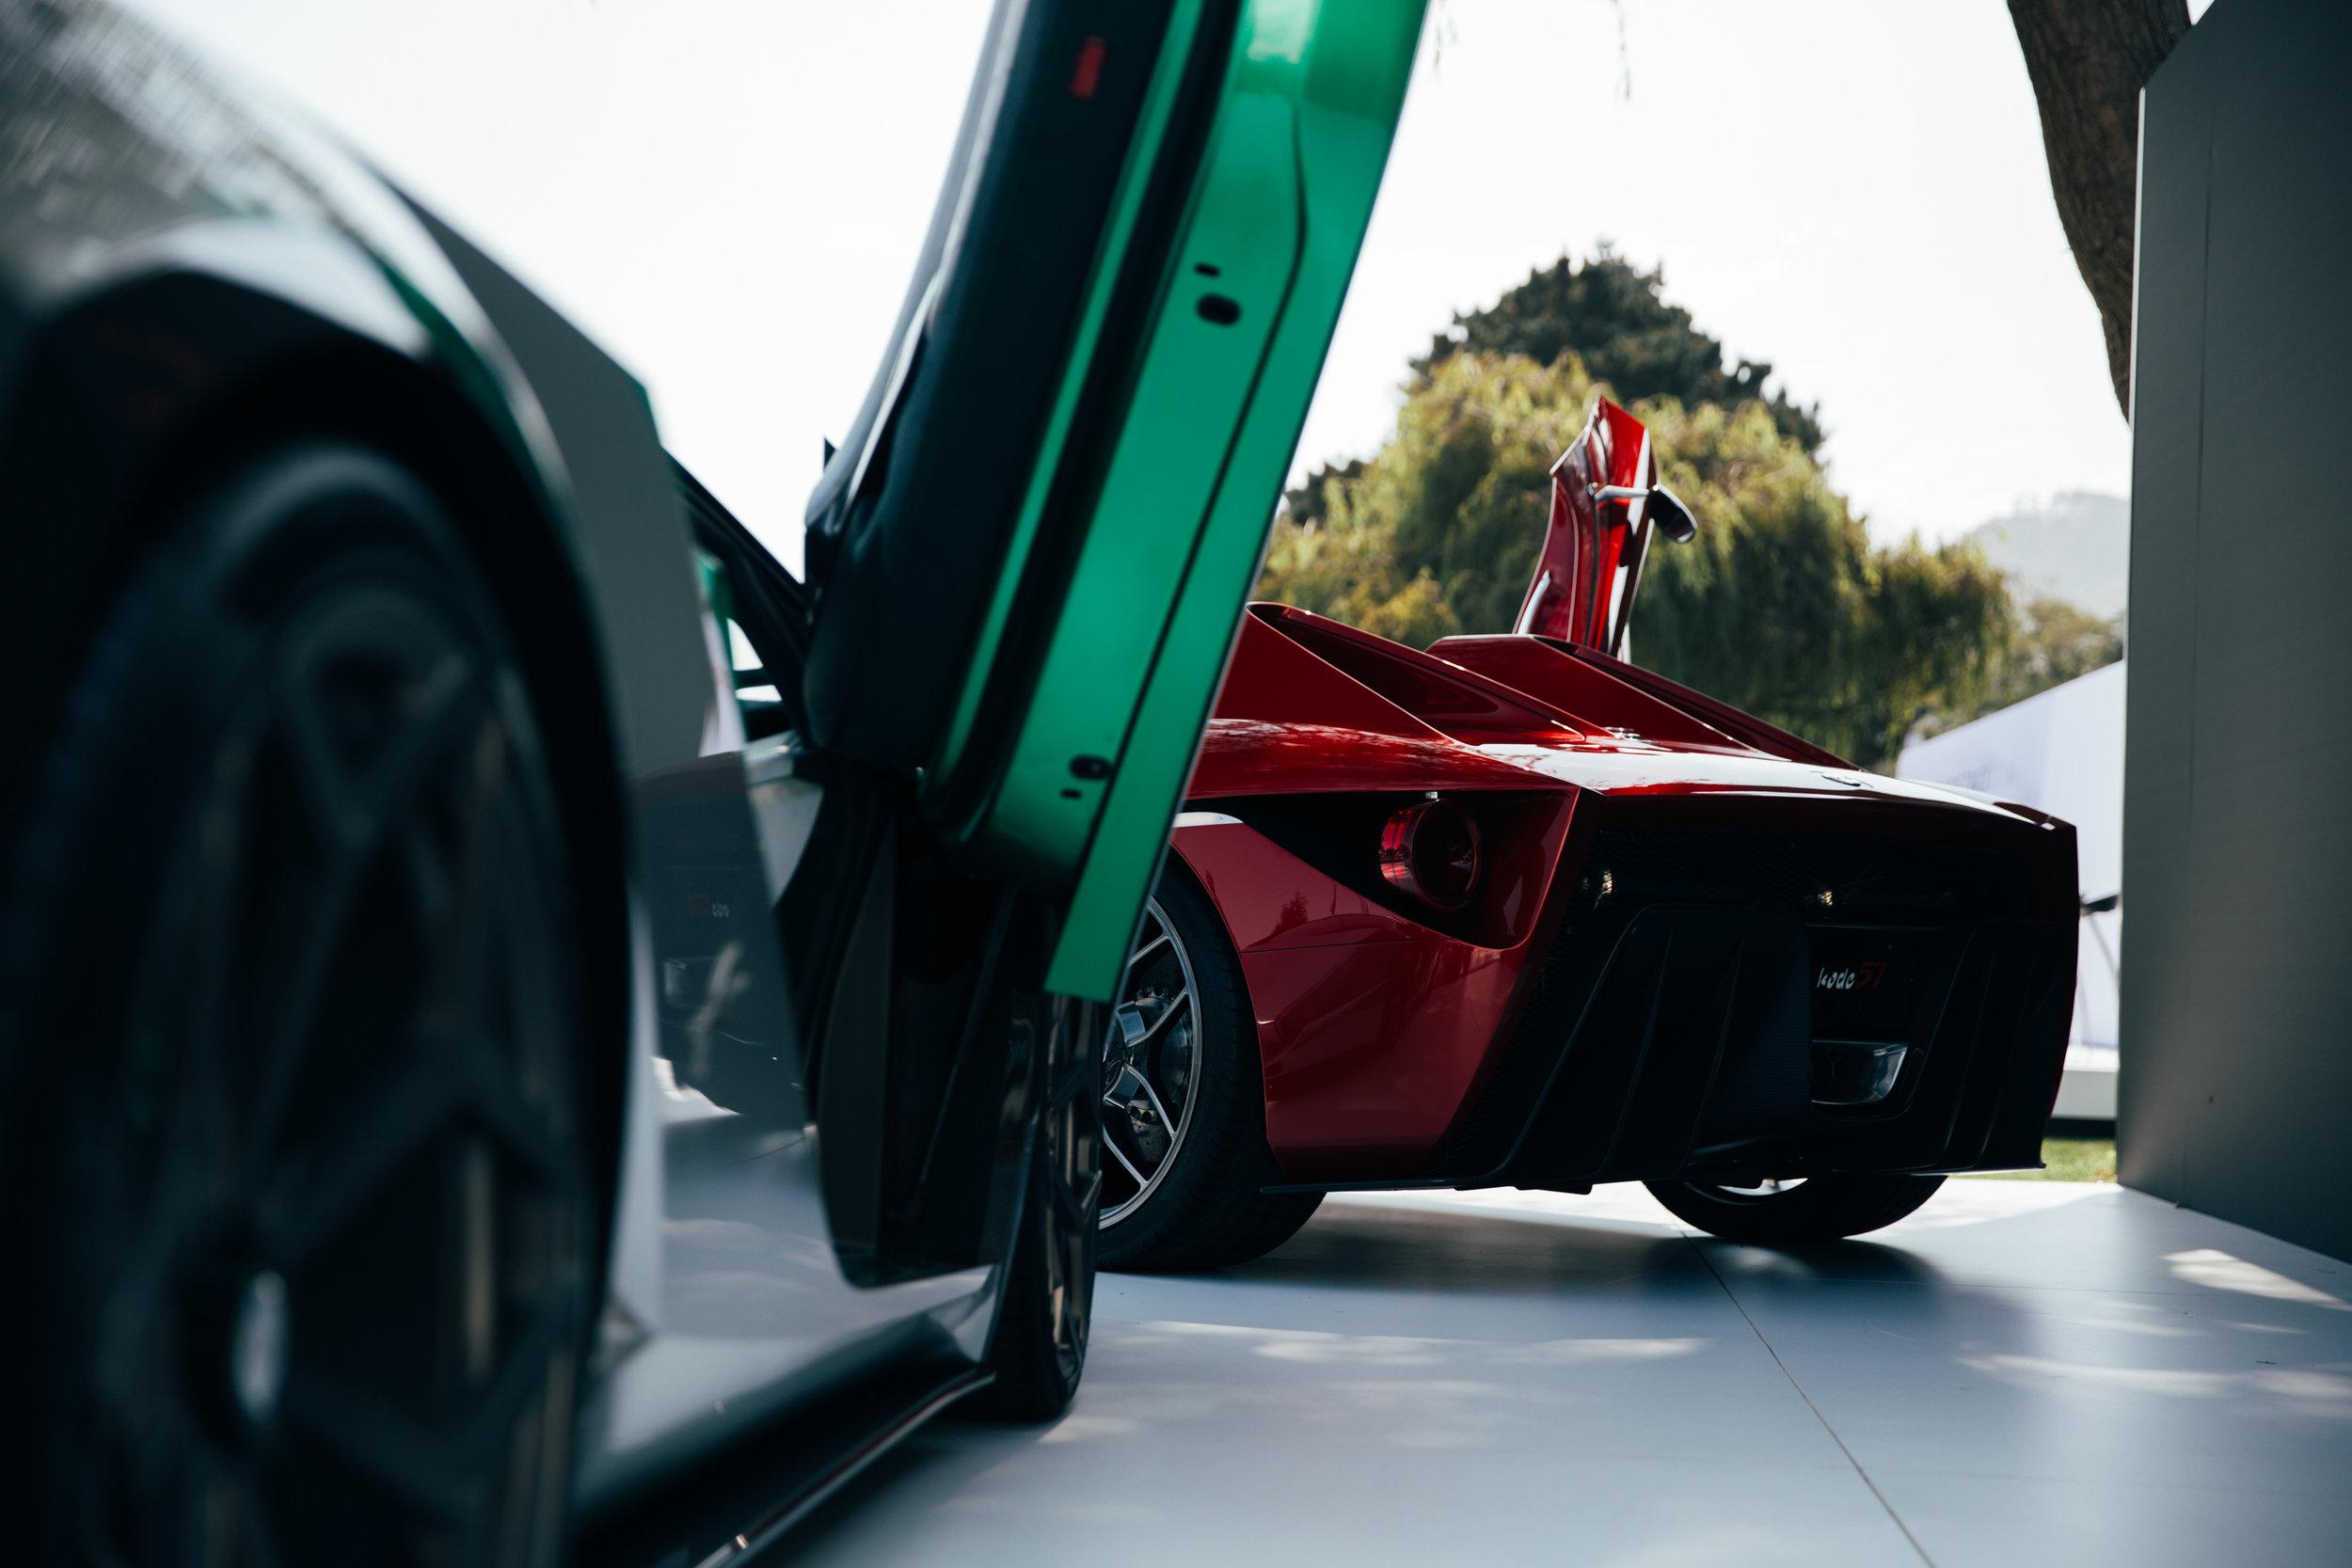 Stay_Driven_Monterey_Car_Week_6-10.jpg